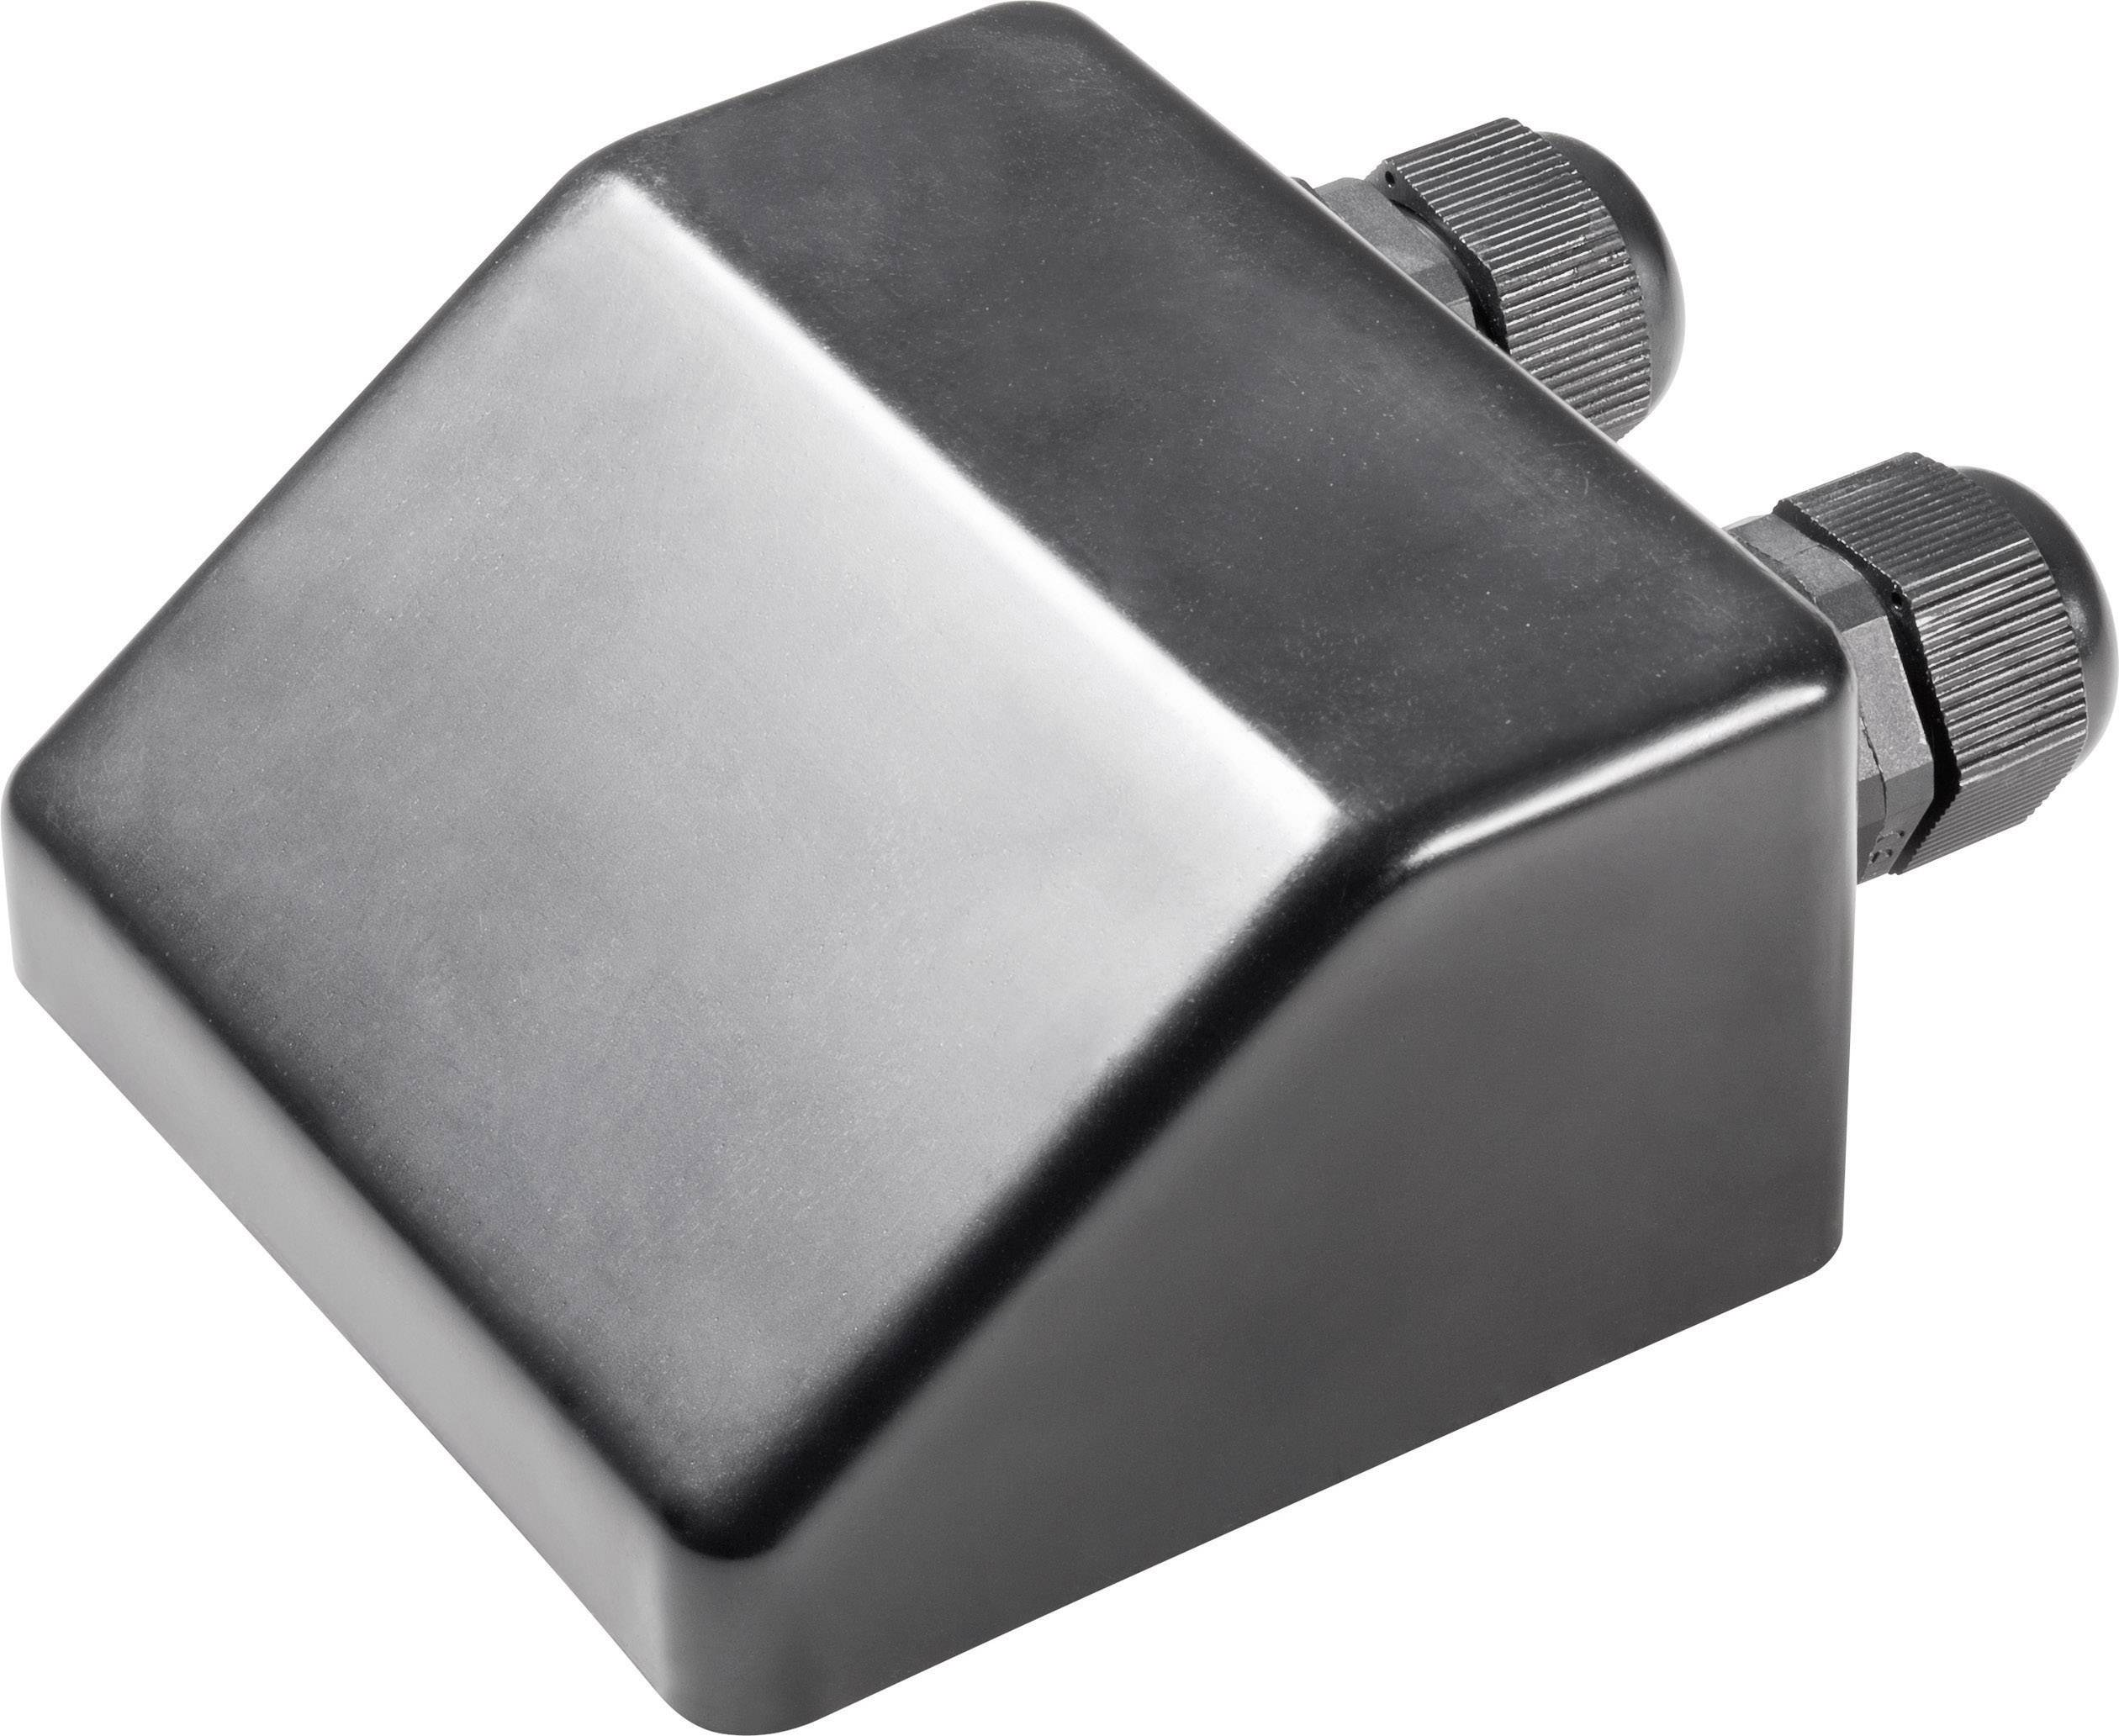 Káblová priechodka Renkforce 110602, 6 - 12 mm Ø